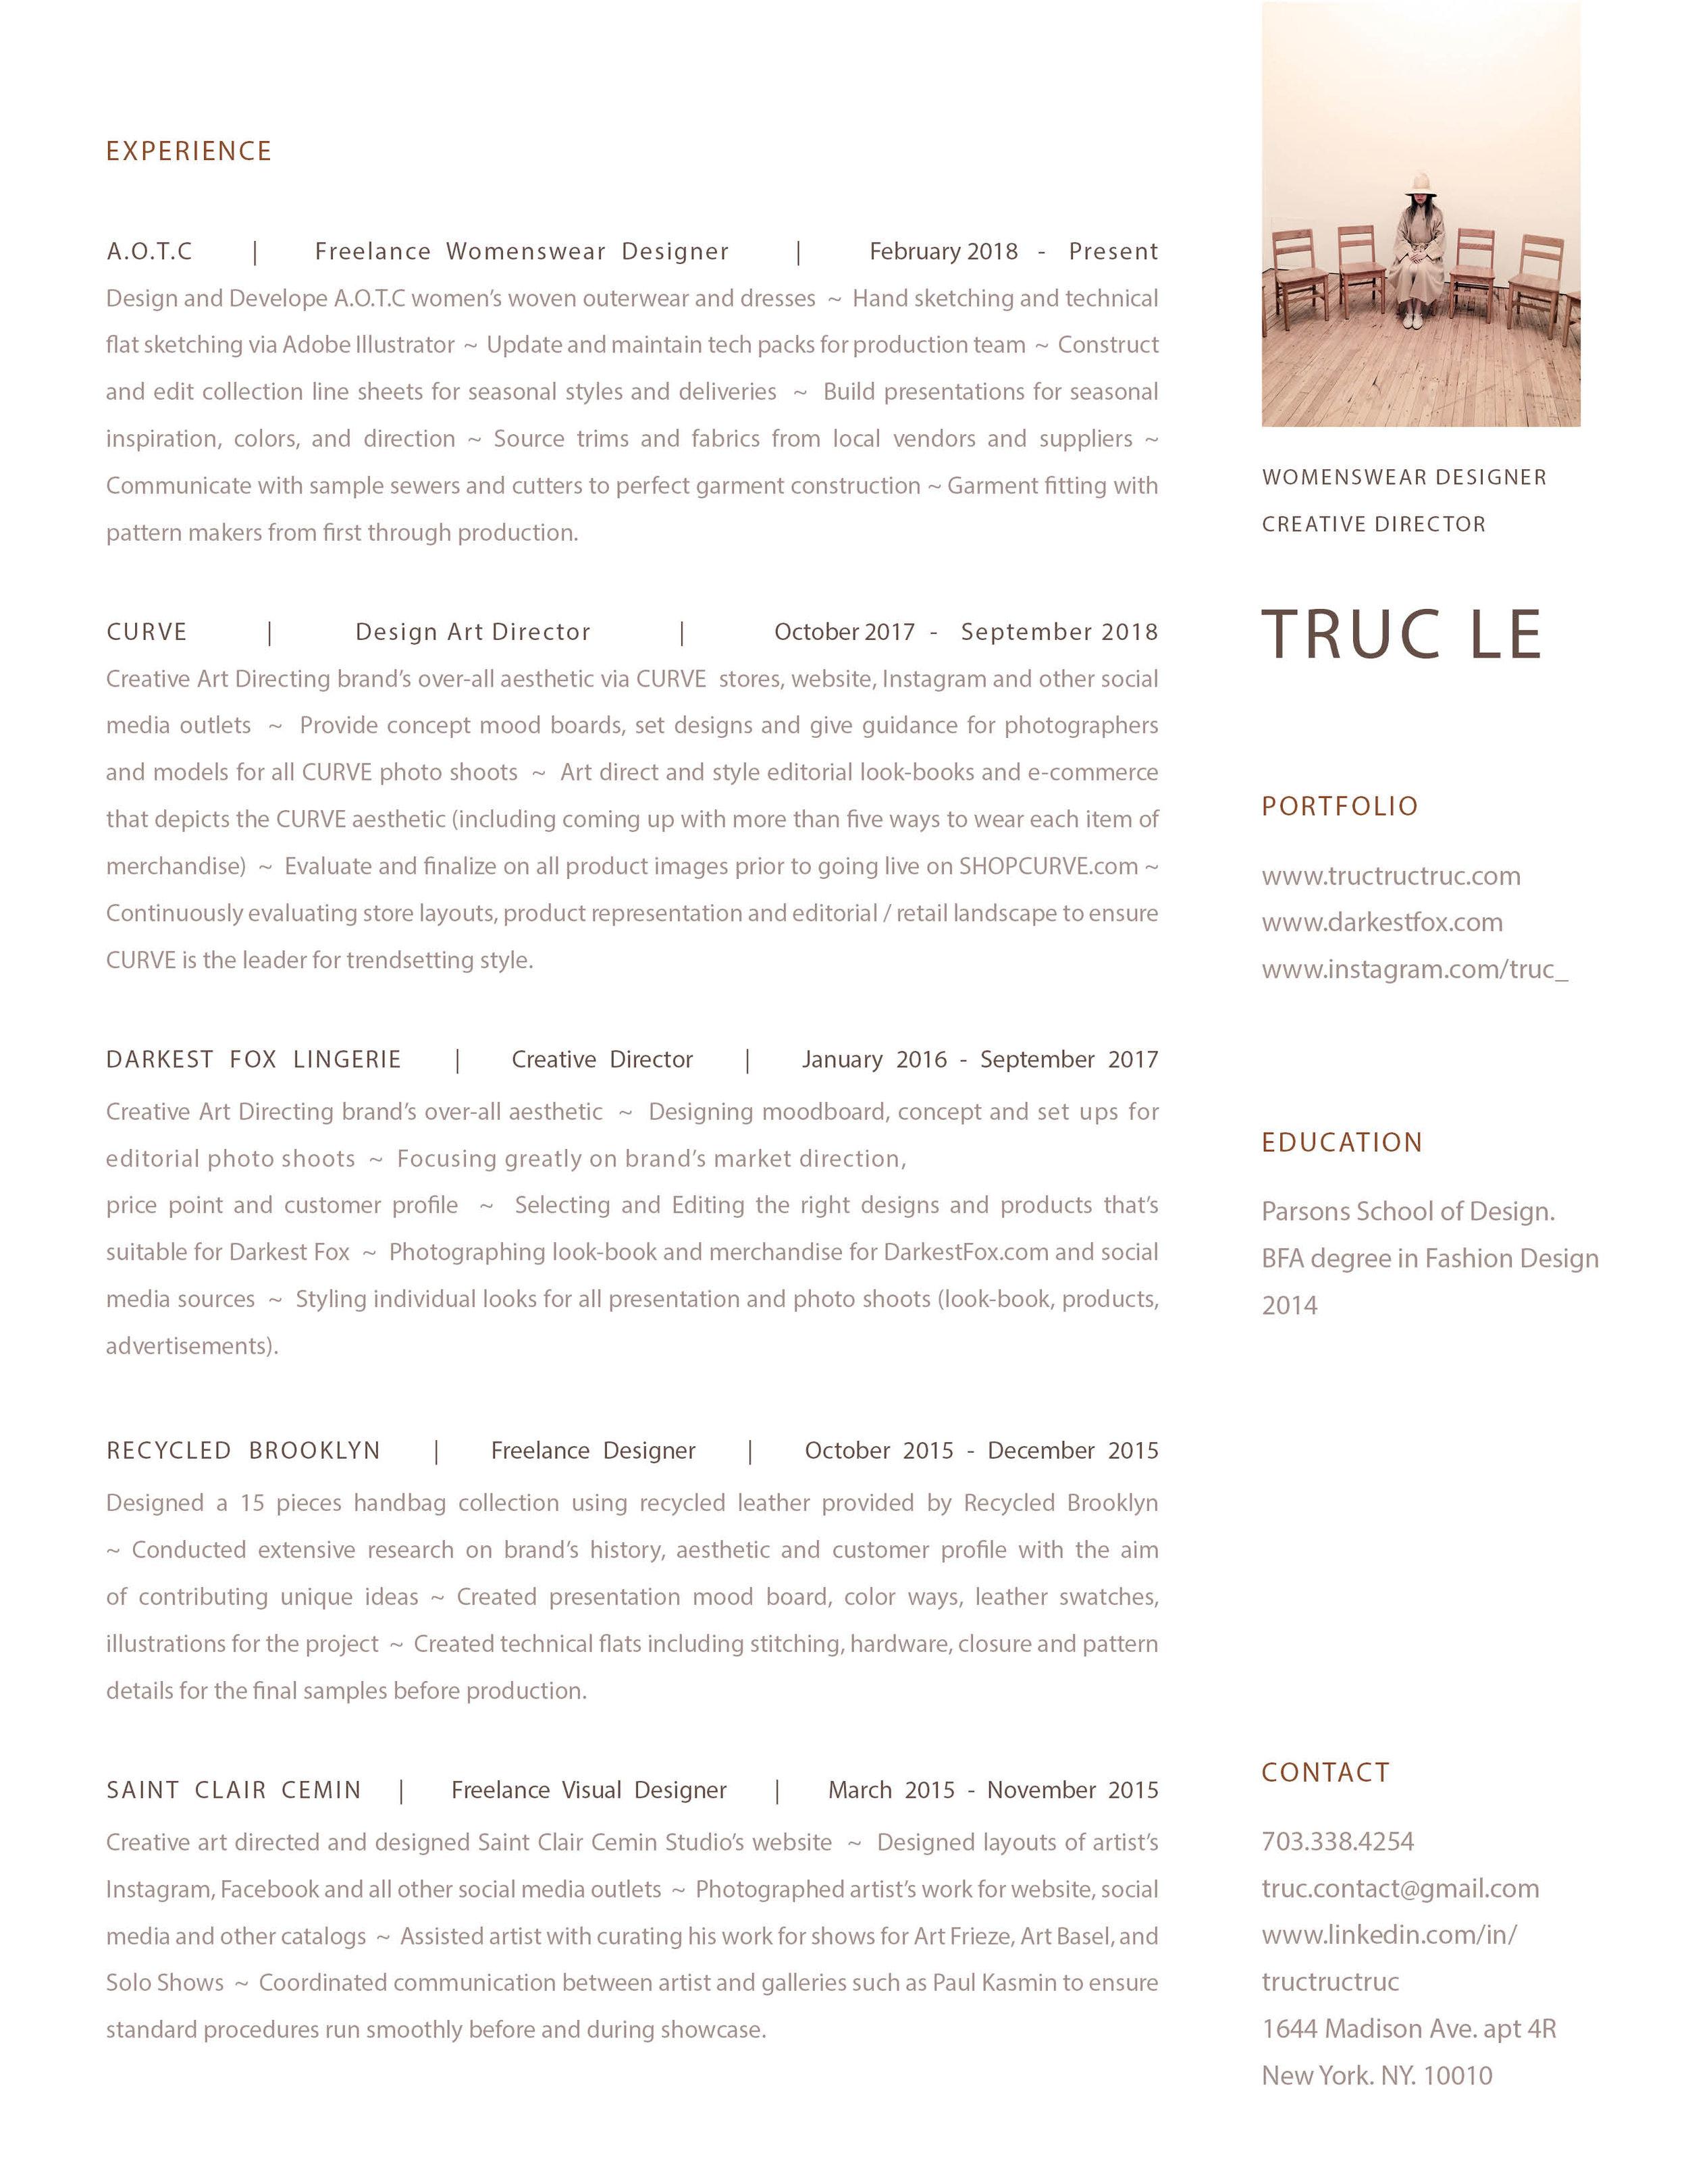 TRUC_Design_Resume_2019.jpg